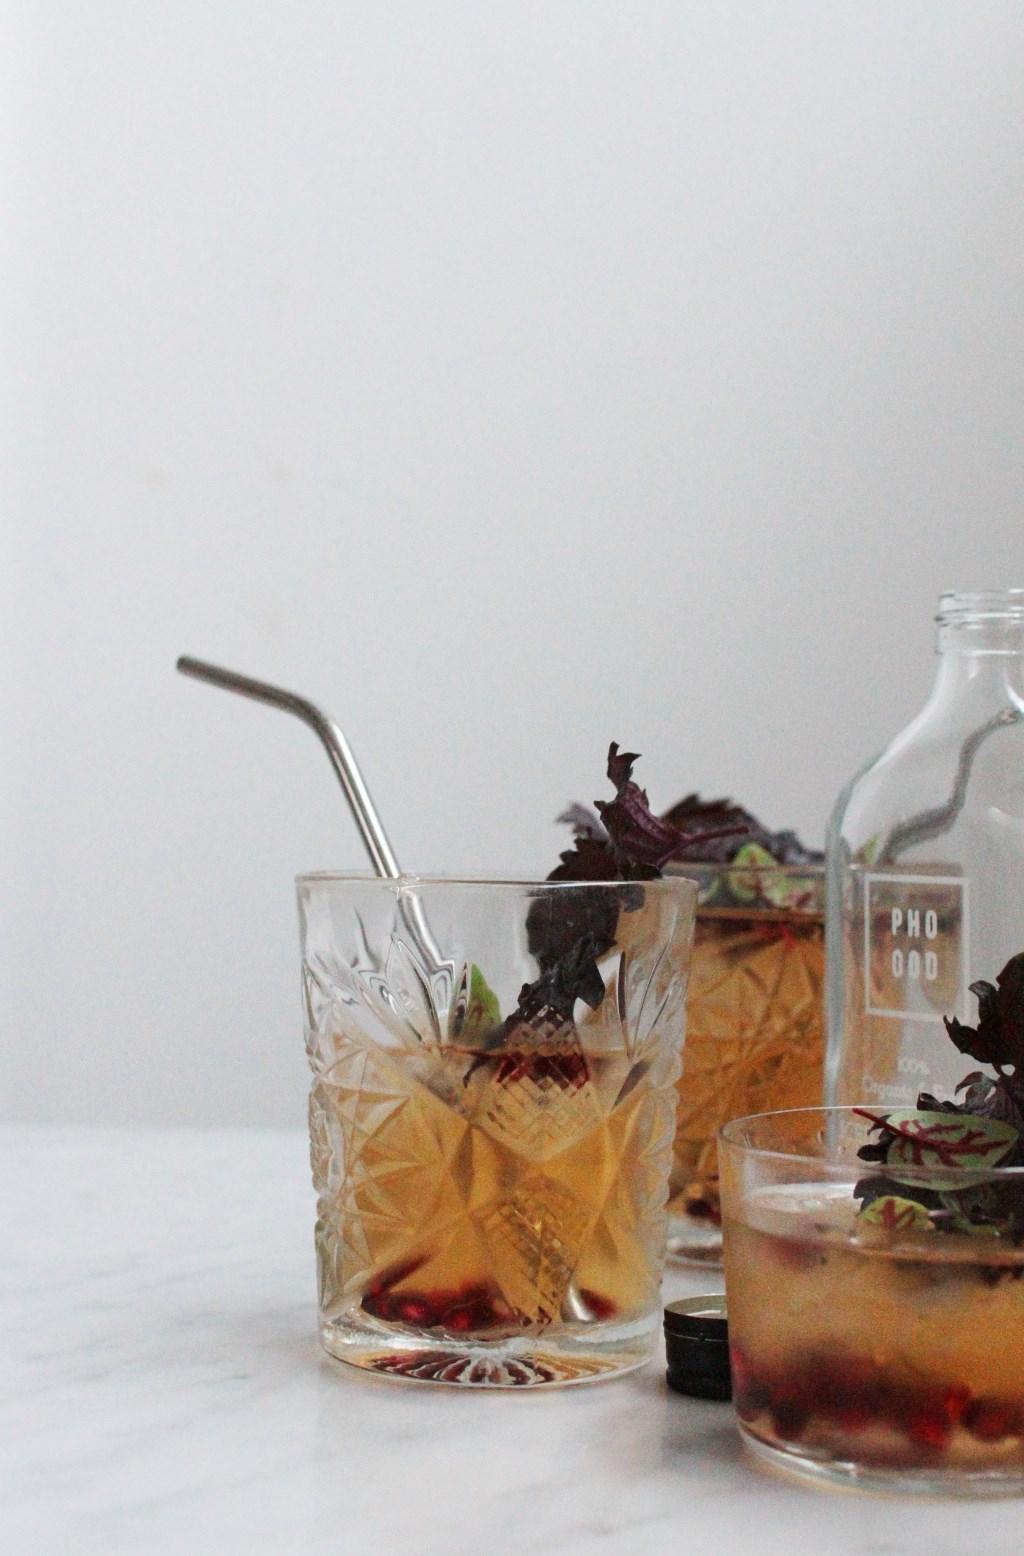 'The Aphrodesiac' - Herbal Ice Tea Foto: Kyra de Vreeze © grenskoerier